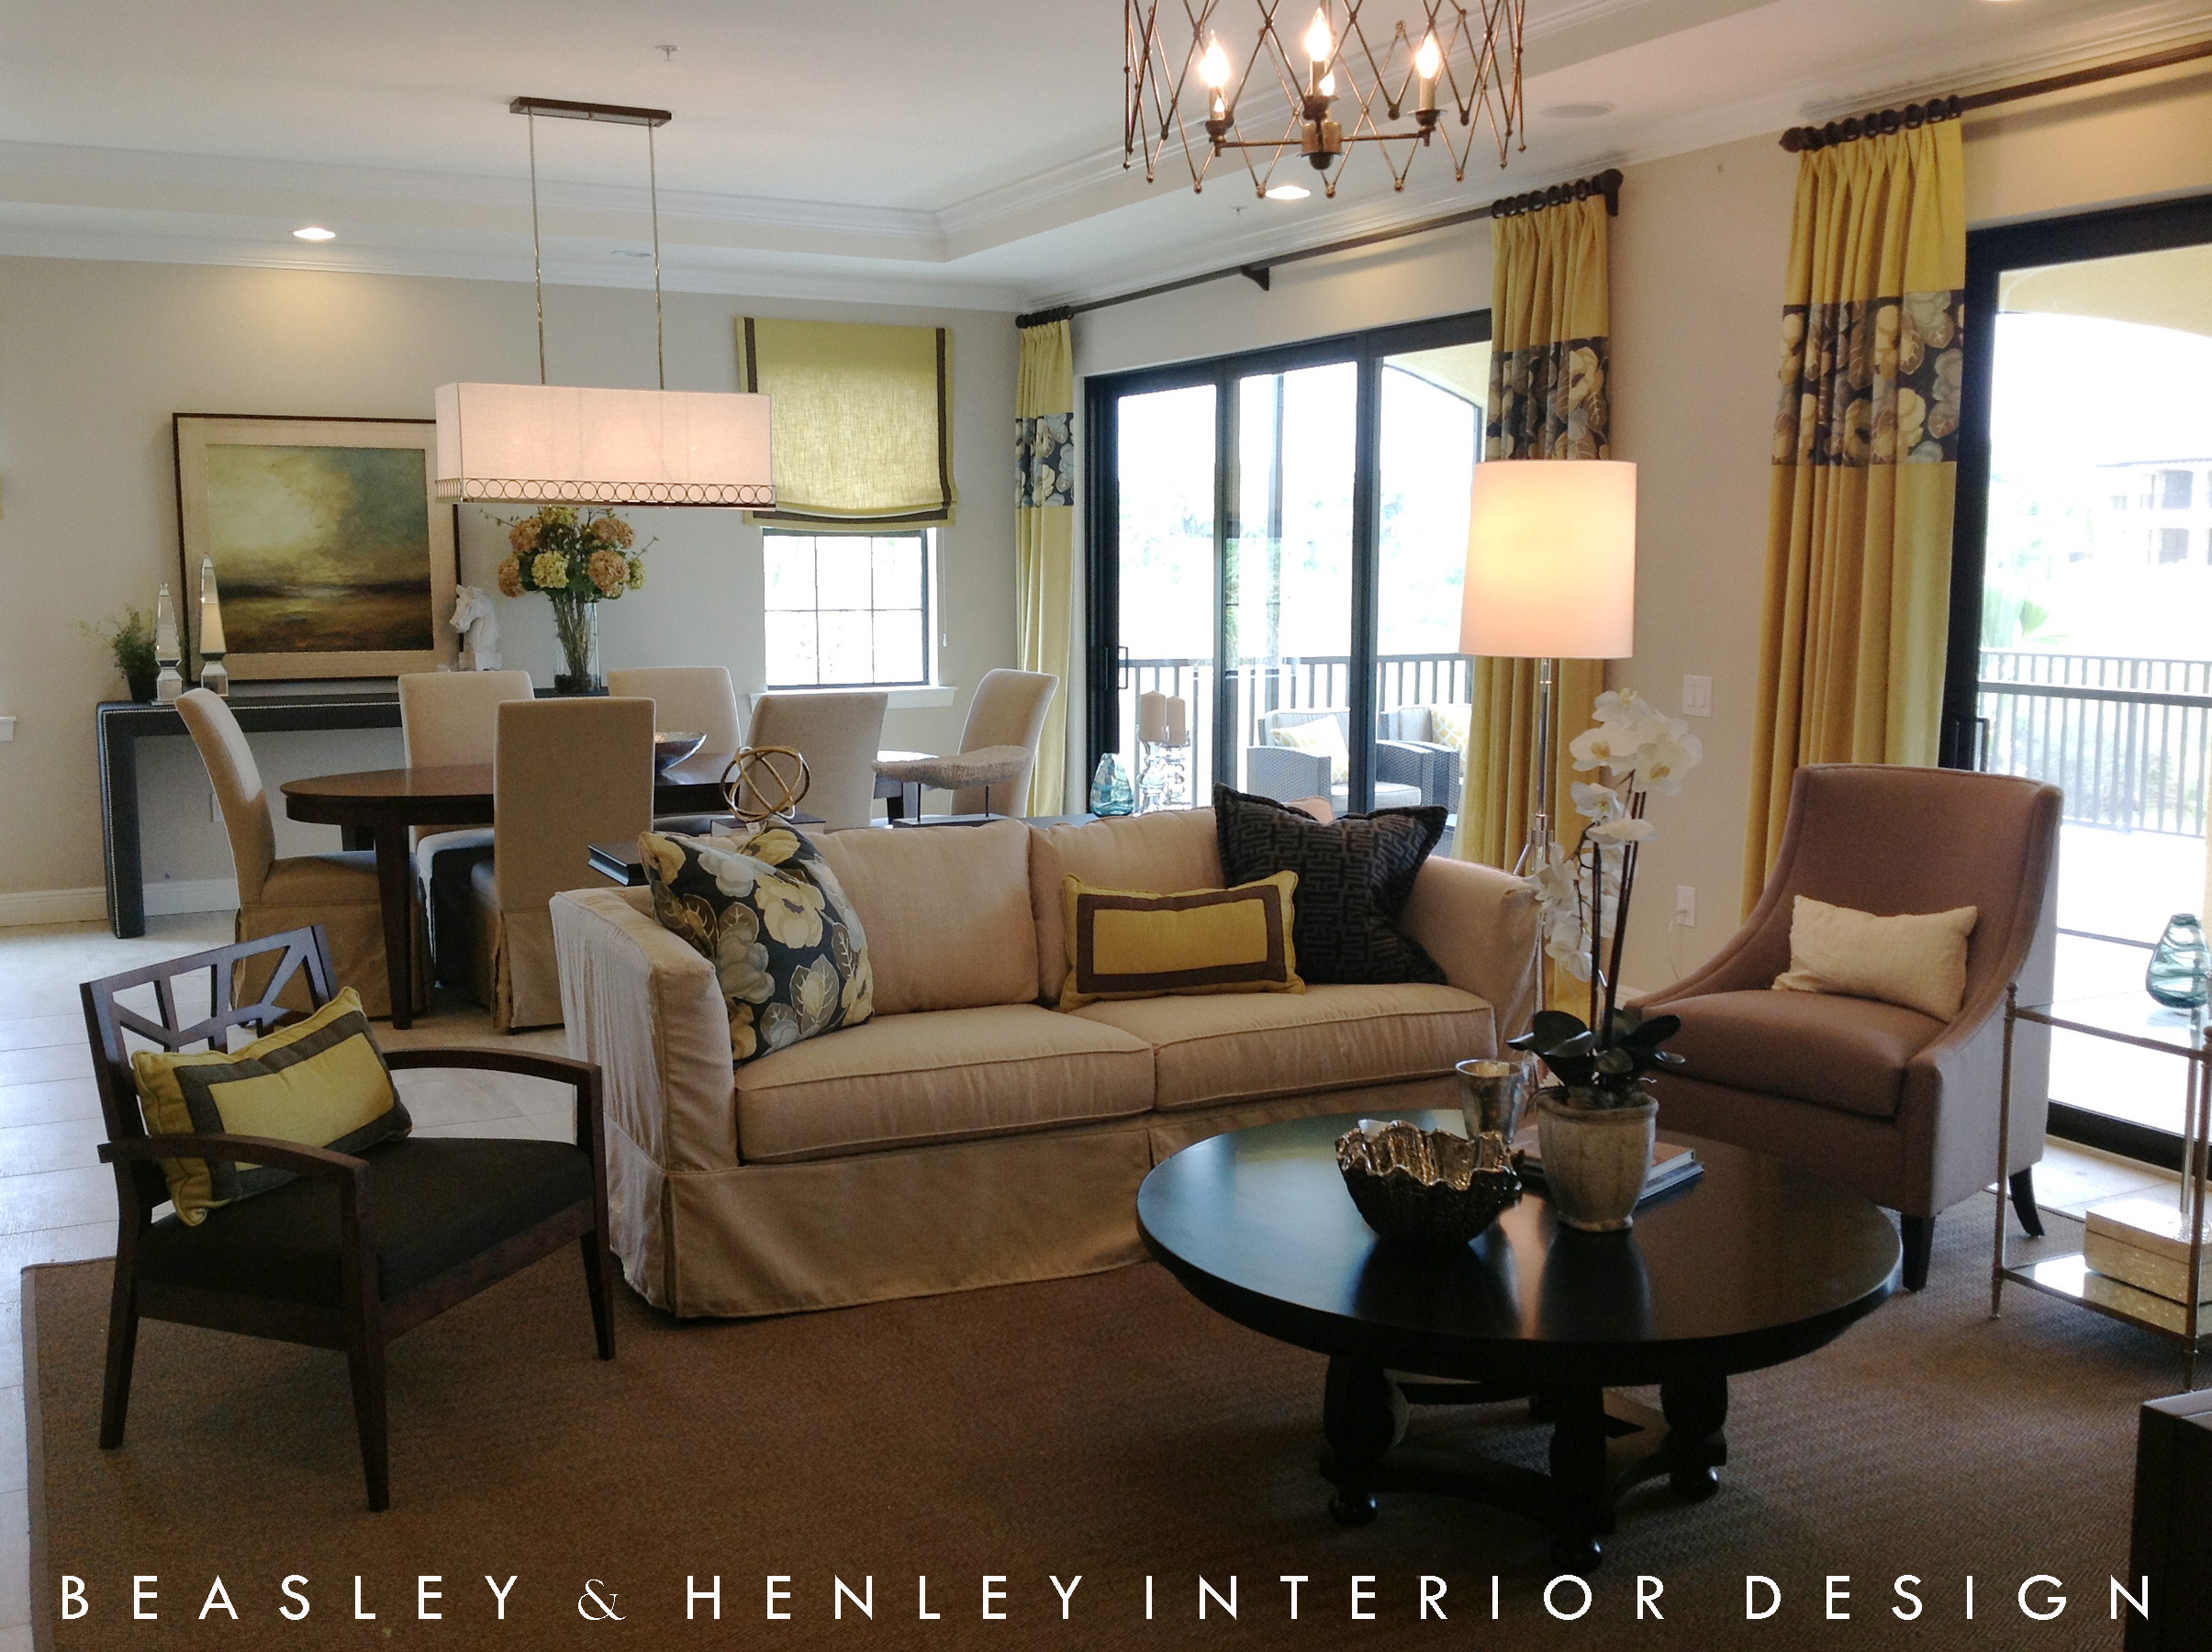 Beasley Henley Interior Design Wci Communities Install Luxury Models In Resort Style